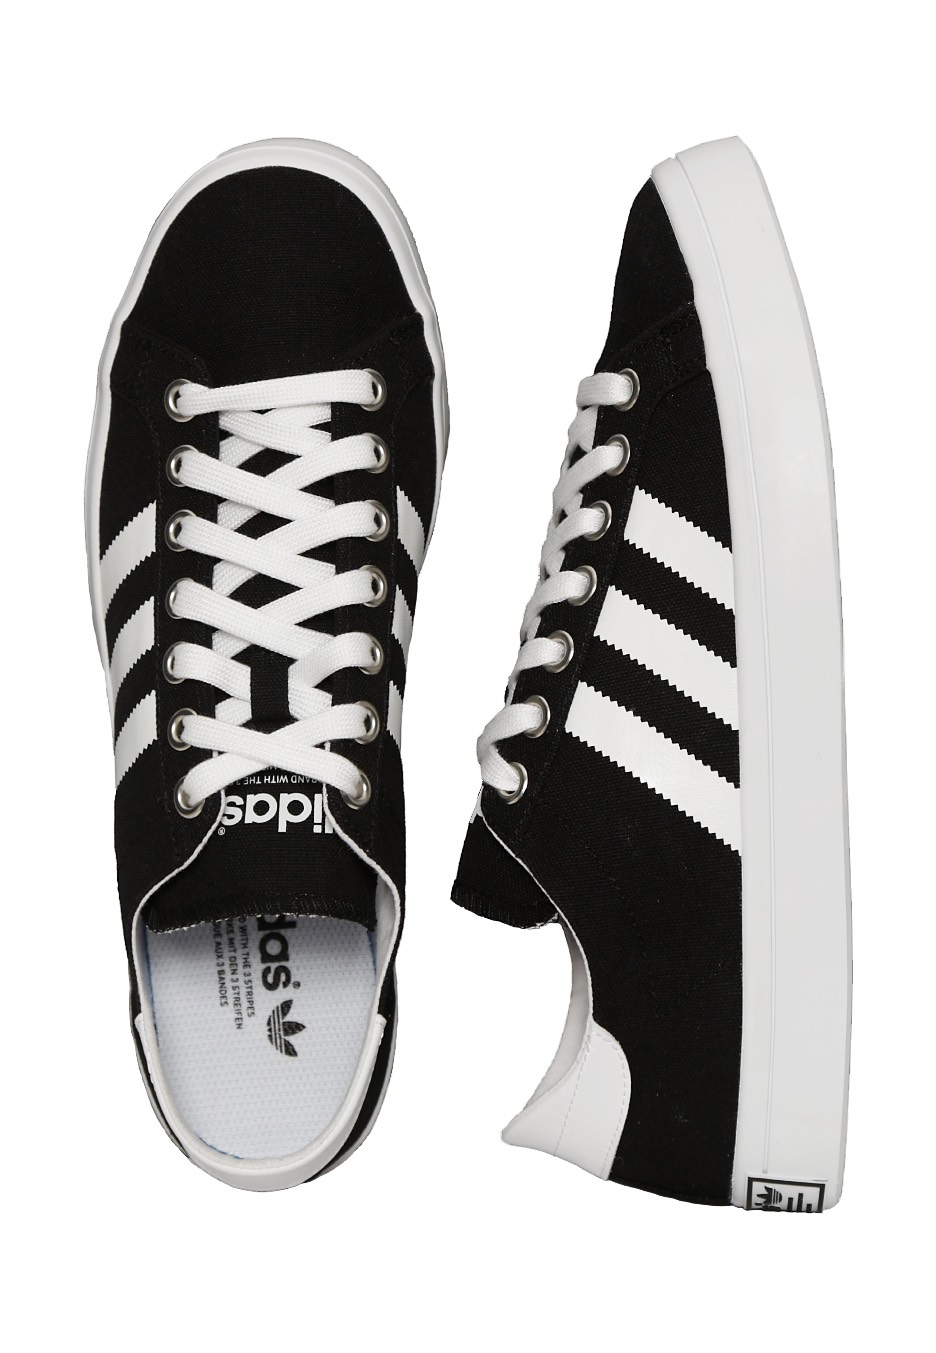 quality design 51ce6 dd0ad Adidas - Court Vantage Core Black FTWR White Metallic Silver SLD - Shoes -  Impericon.com Worldwide